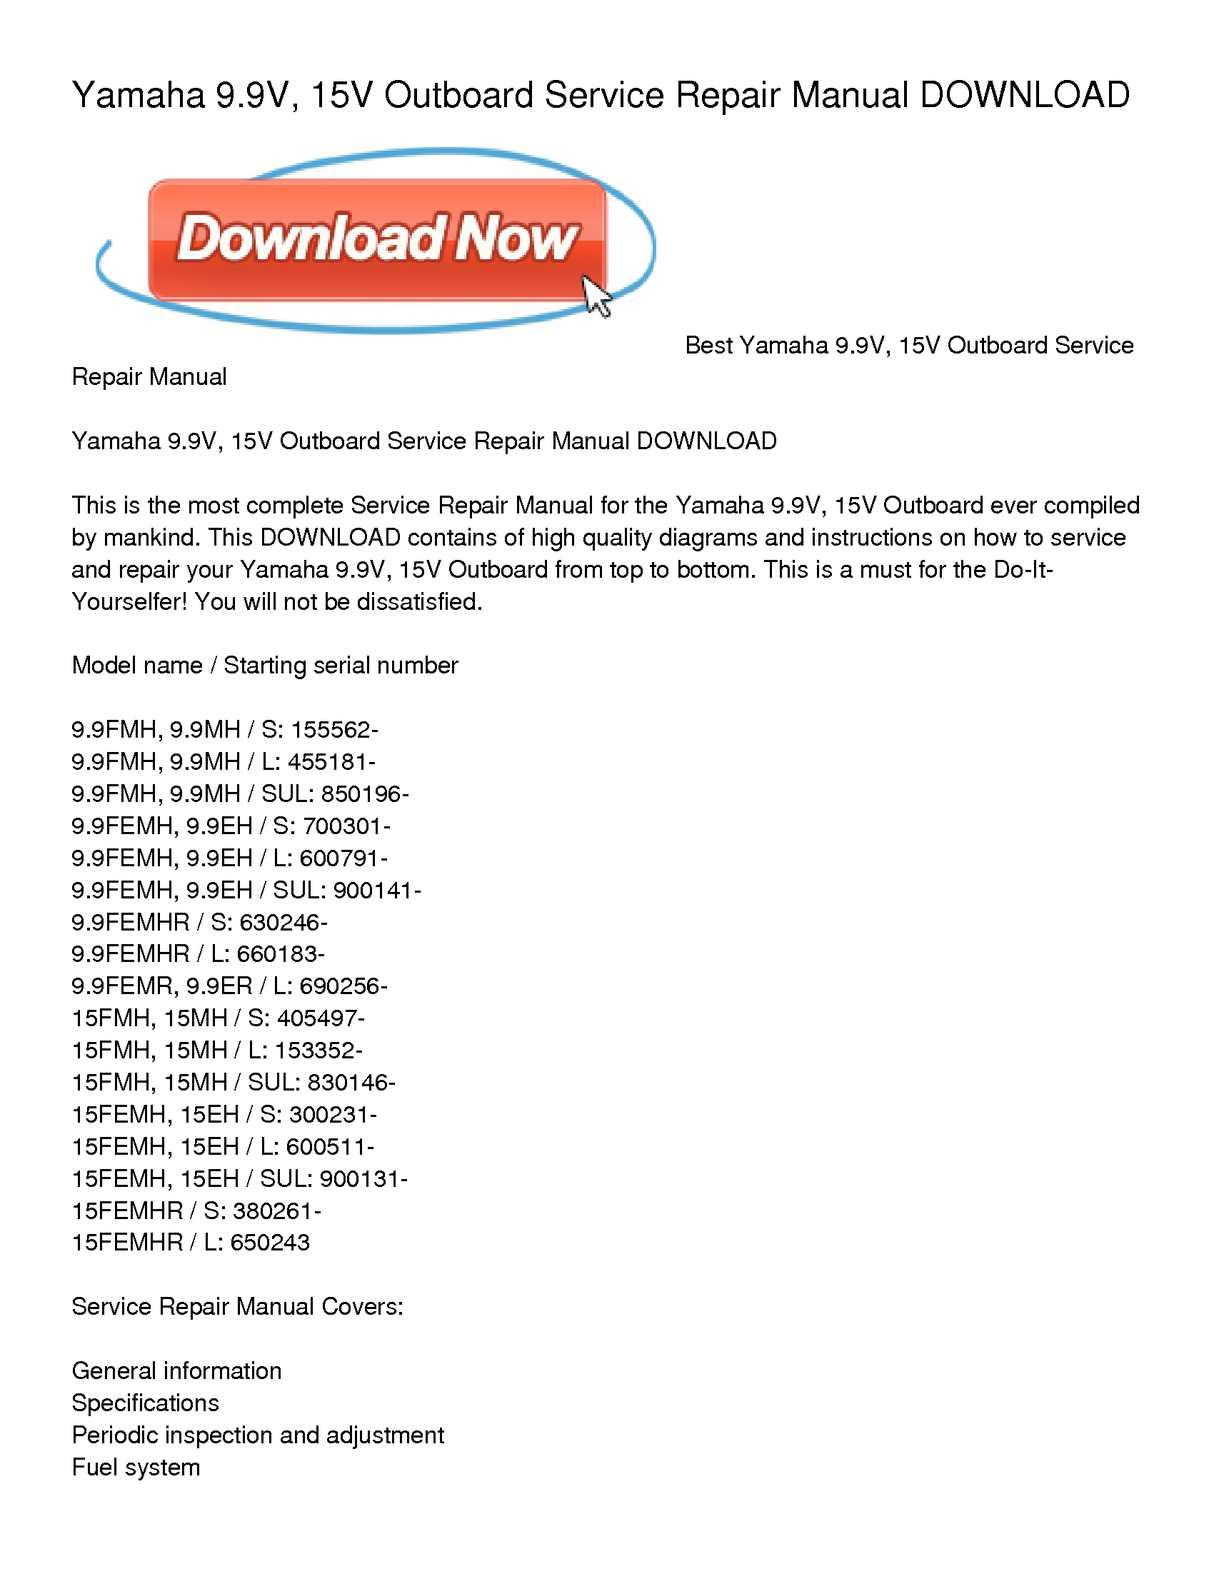 calam o yamaha 9 9v 15v outboard service repair manual download rh calameo com force outboard repair manual pdf repair manual for 9.8 mercury outboard